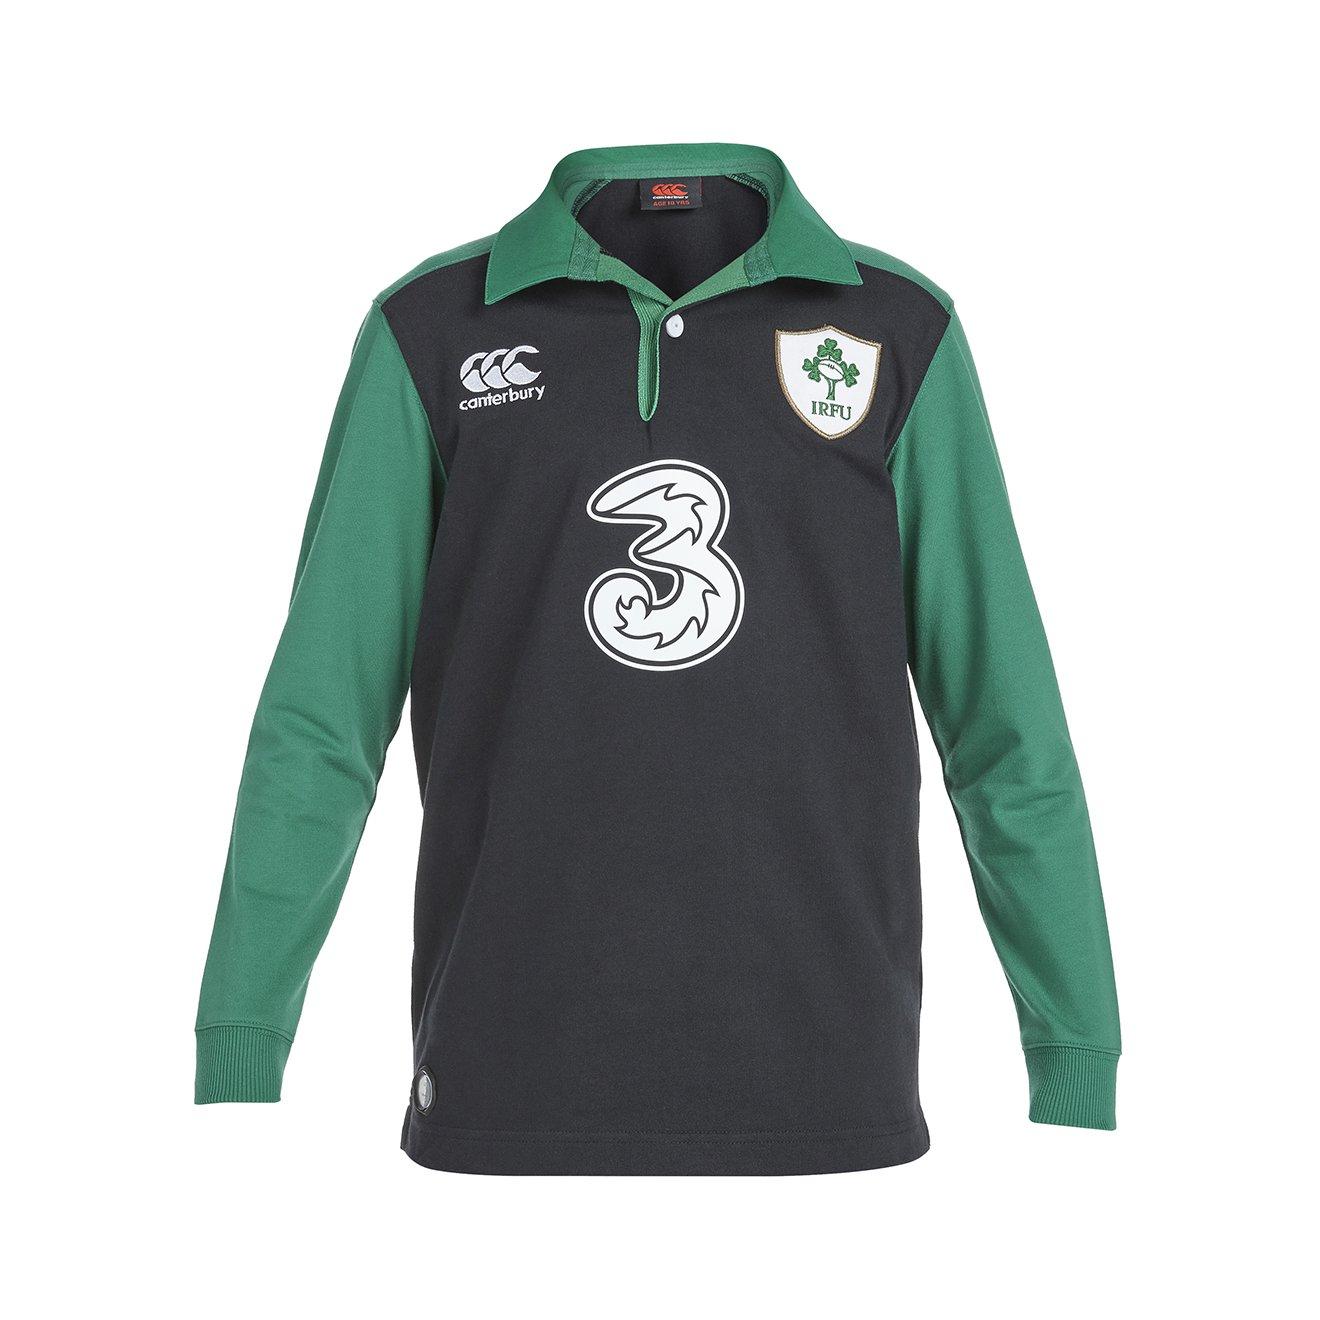 2015-2016 Ireland Alternate Classic LS Rugby Shirt (Kids) B00ZHVJKH6 Large Boys 29-31